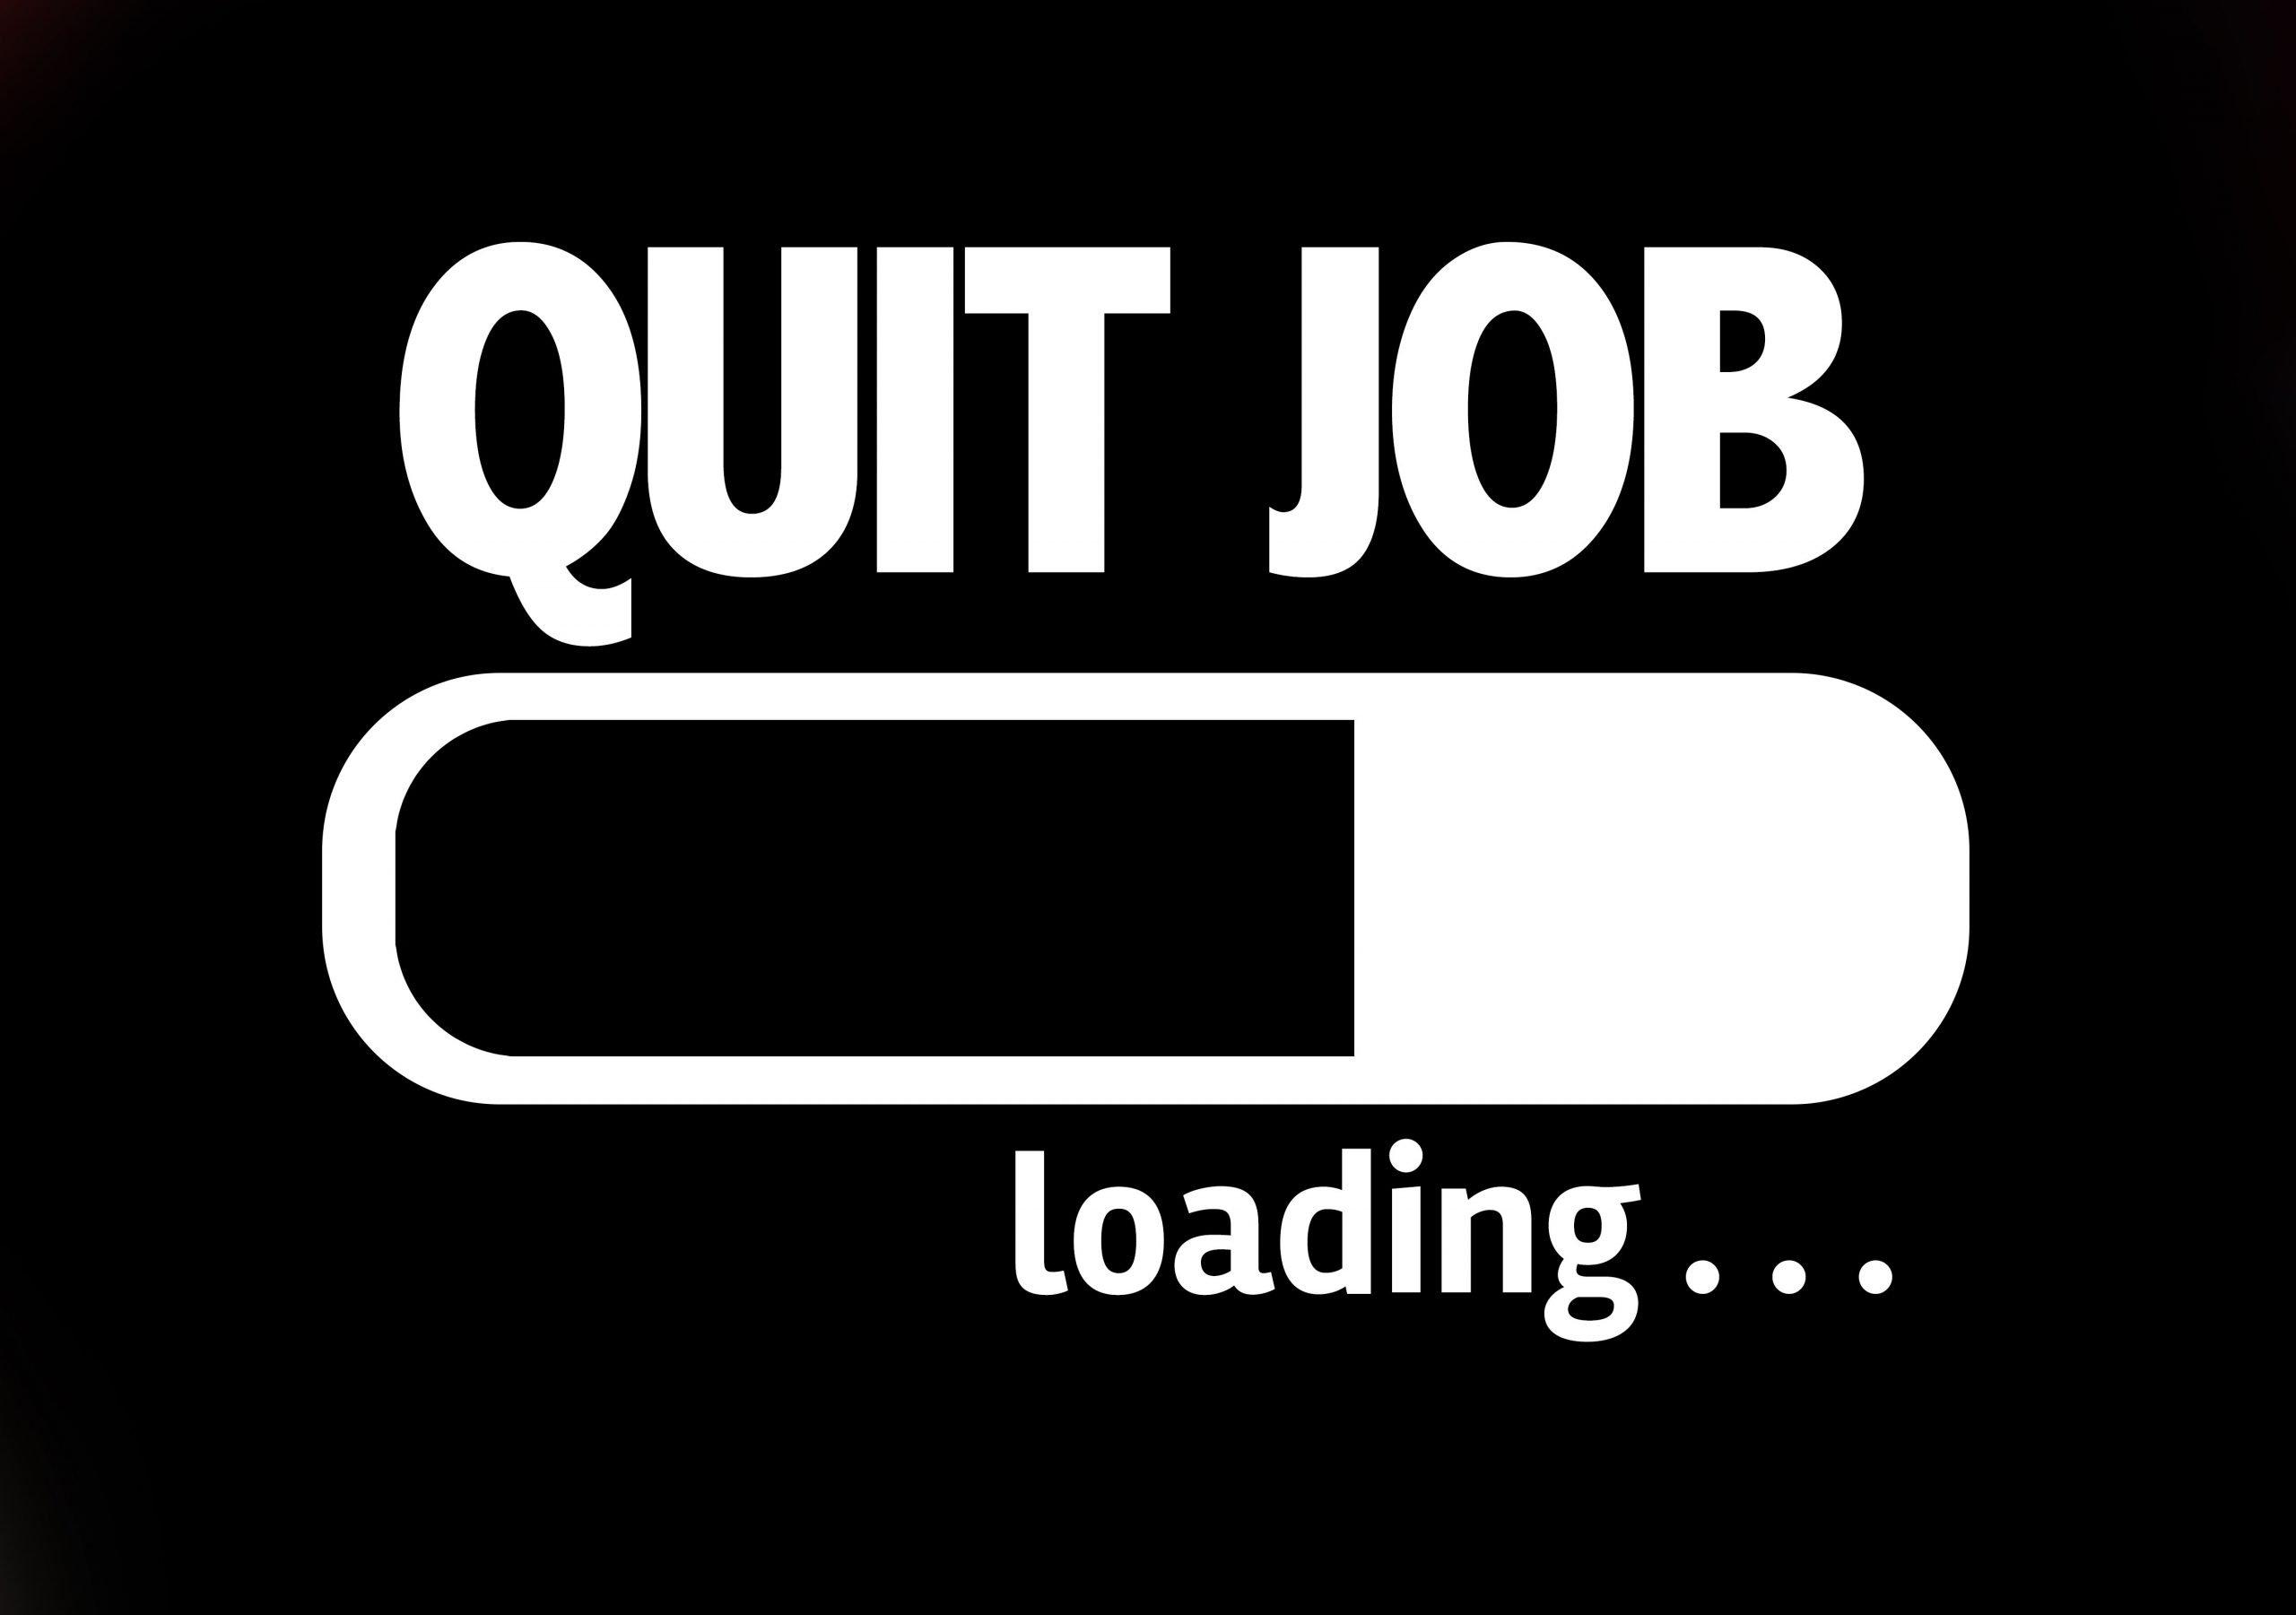 quit job loading indicator